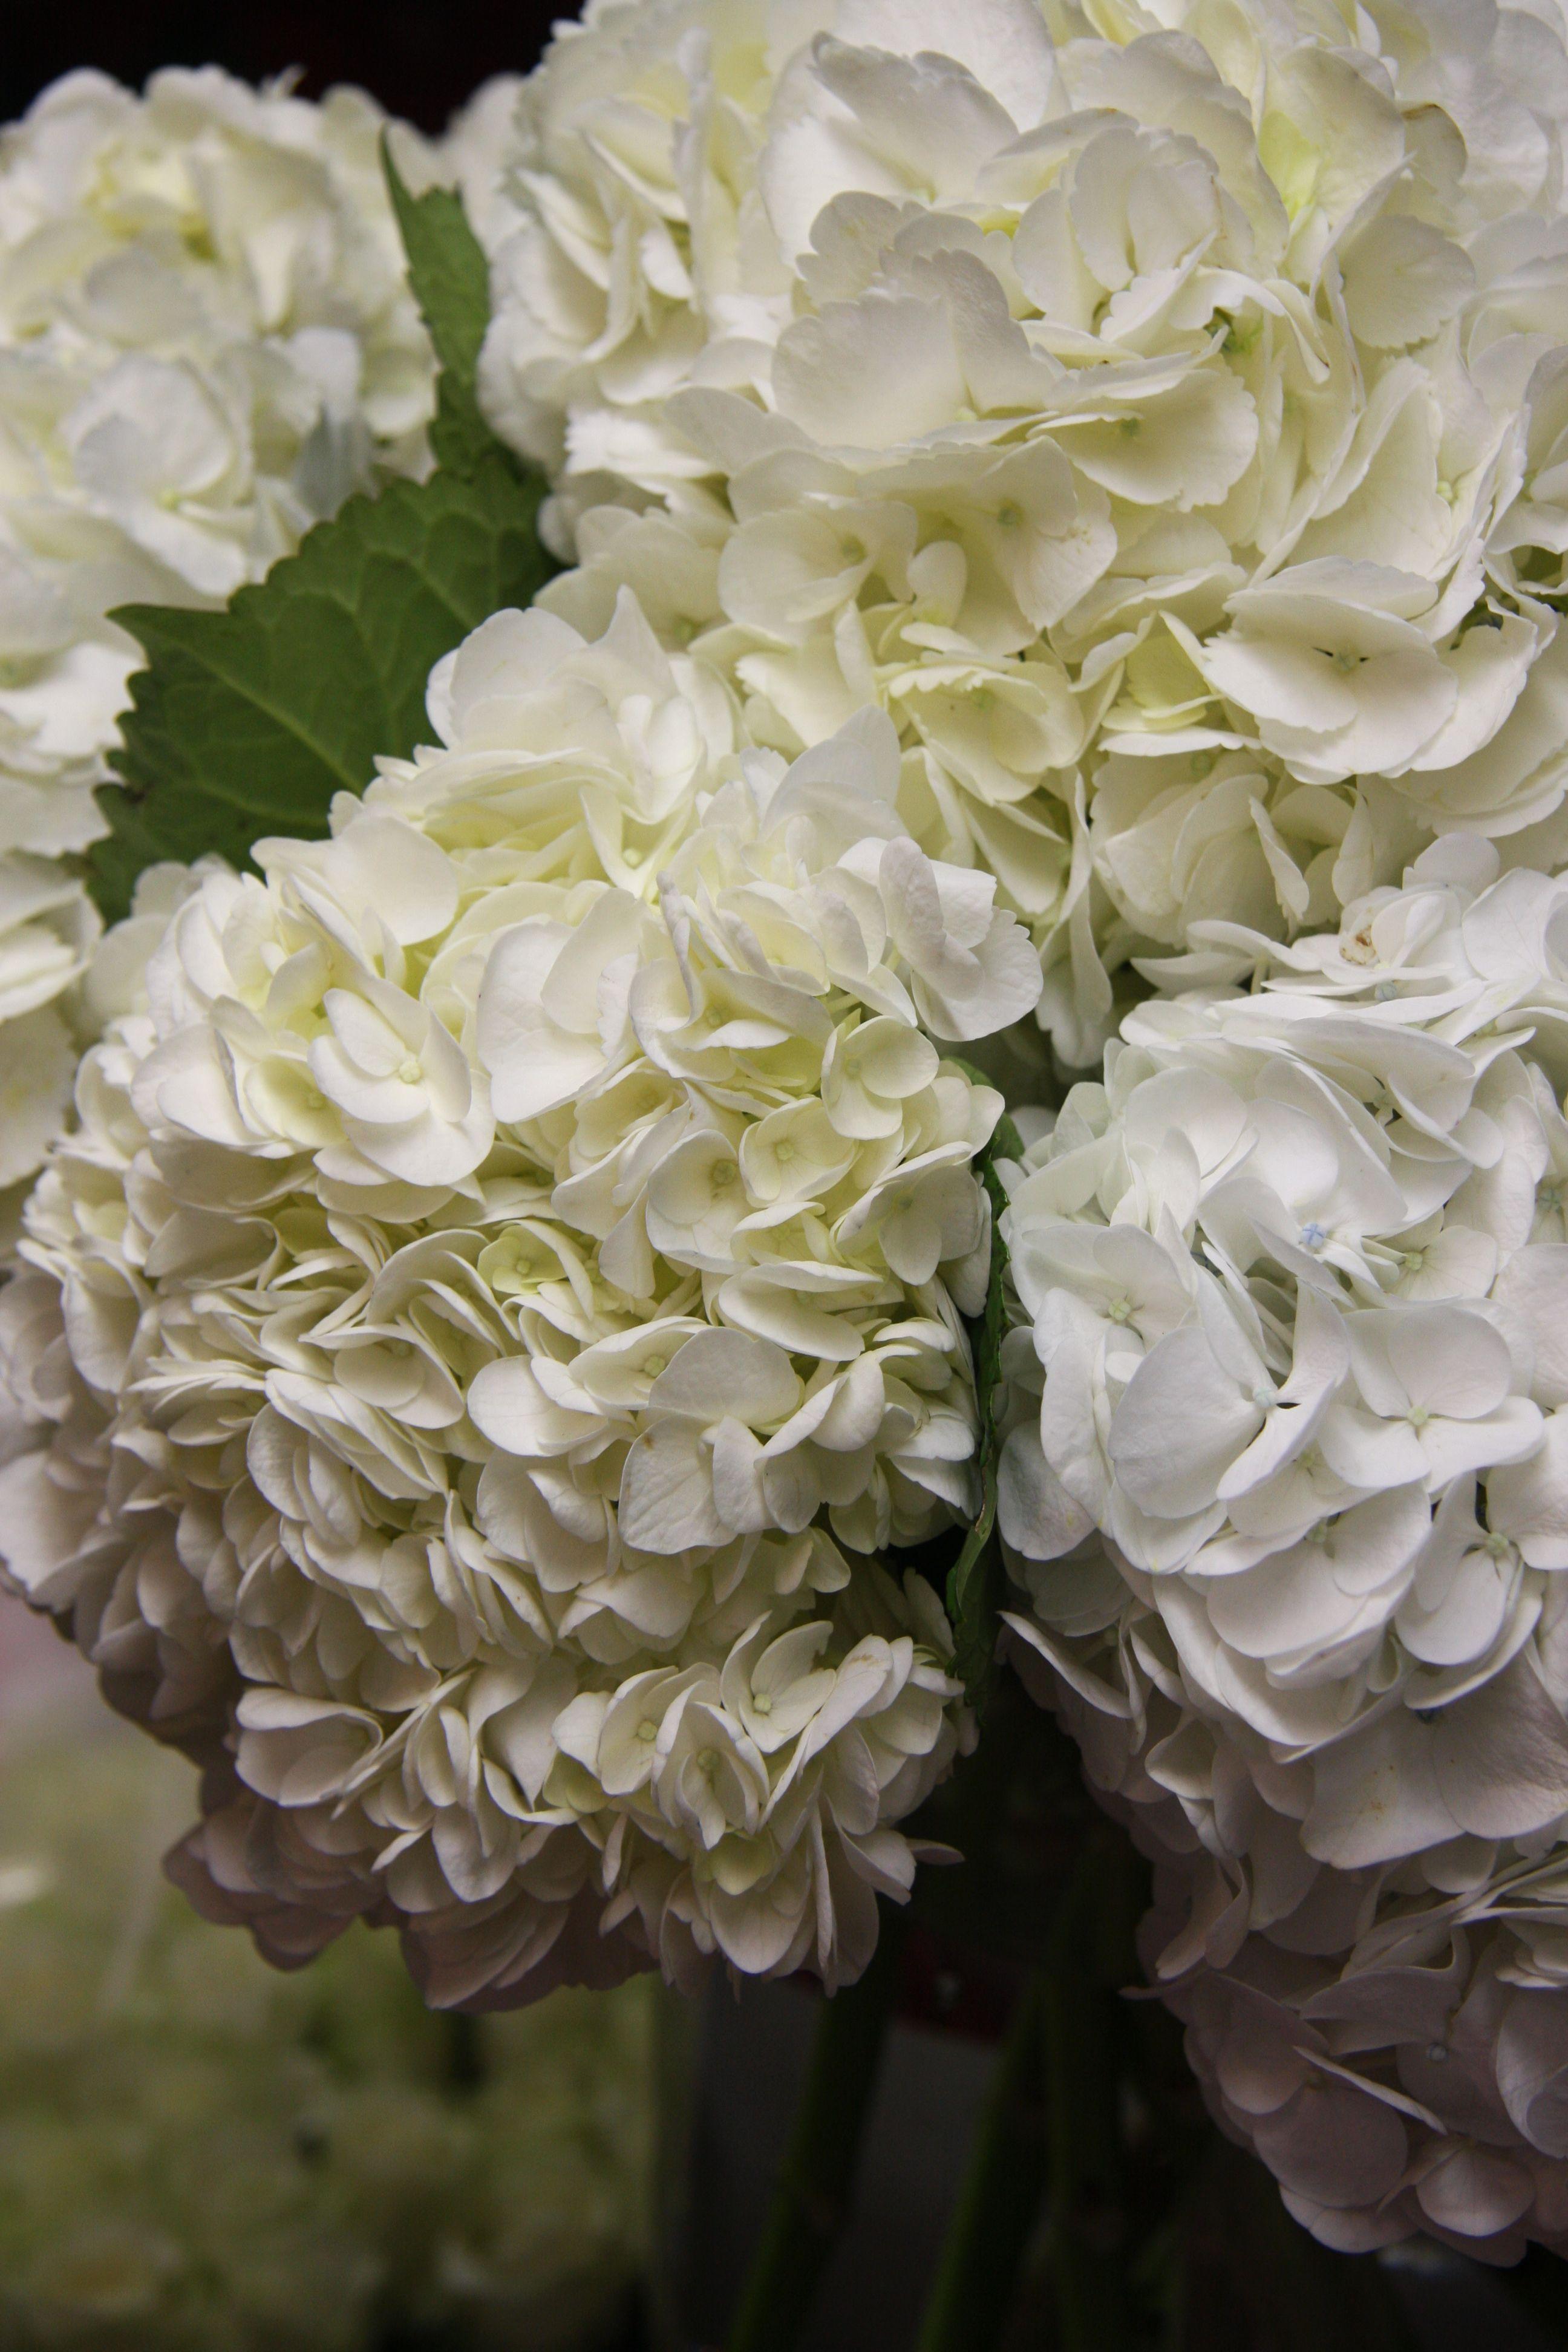 White Hydrangea B C Cottge Pinterest Hydrangea Flowers And